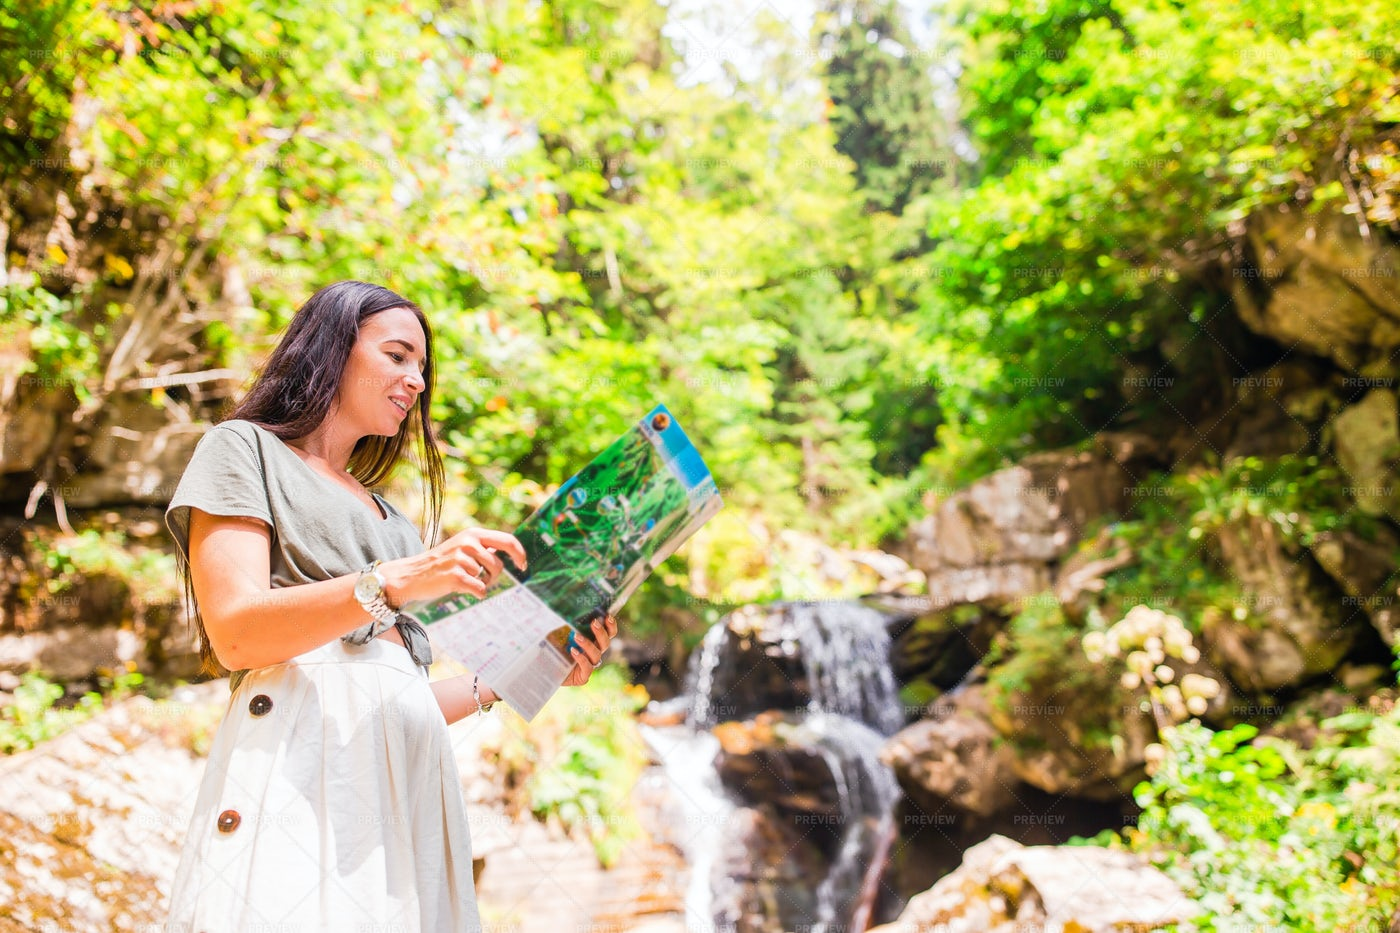 Woman Check Hiking Map: Stock Photos